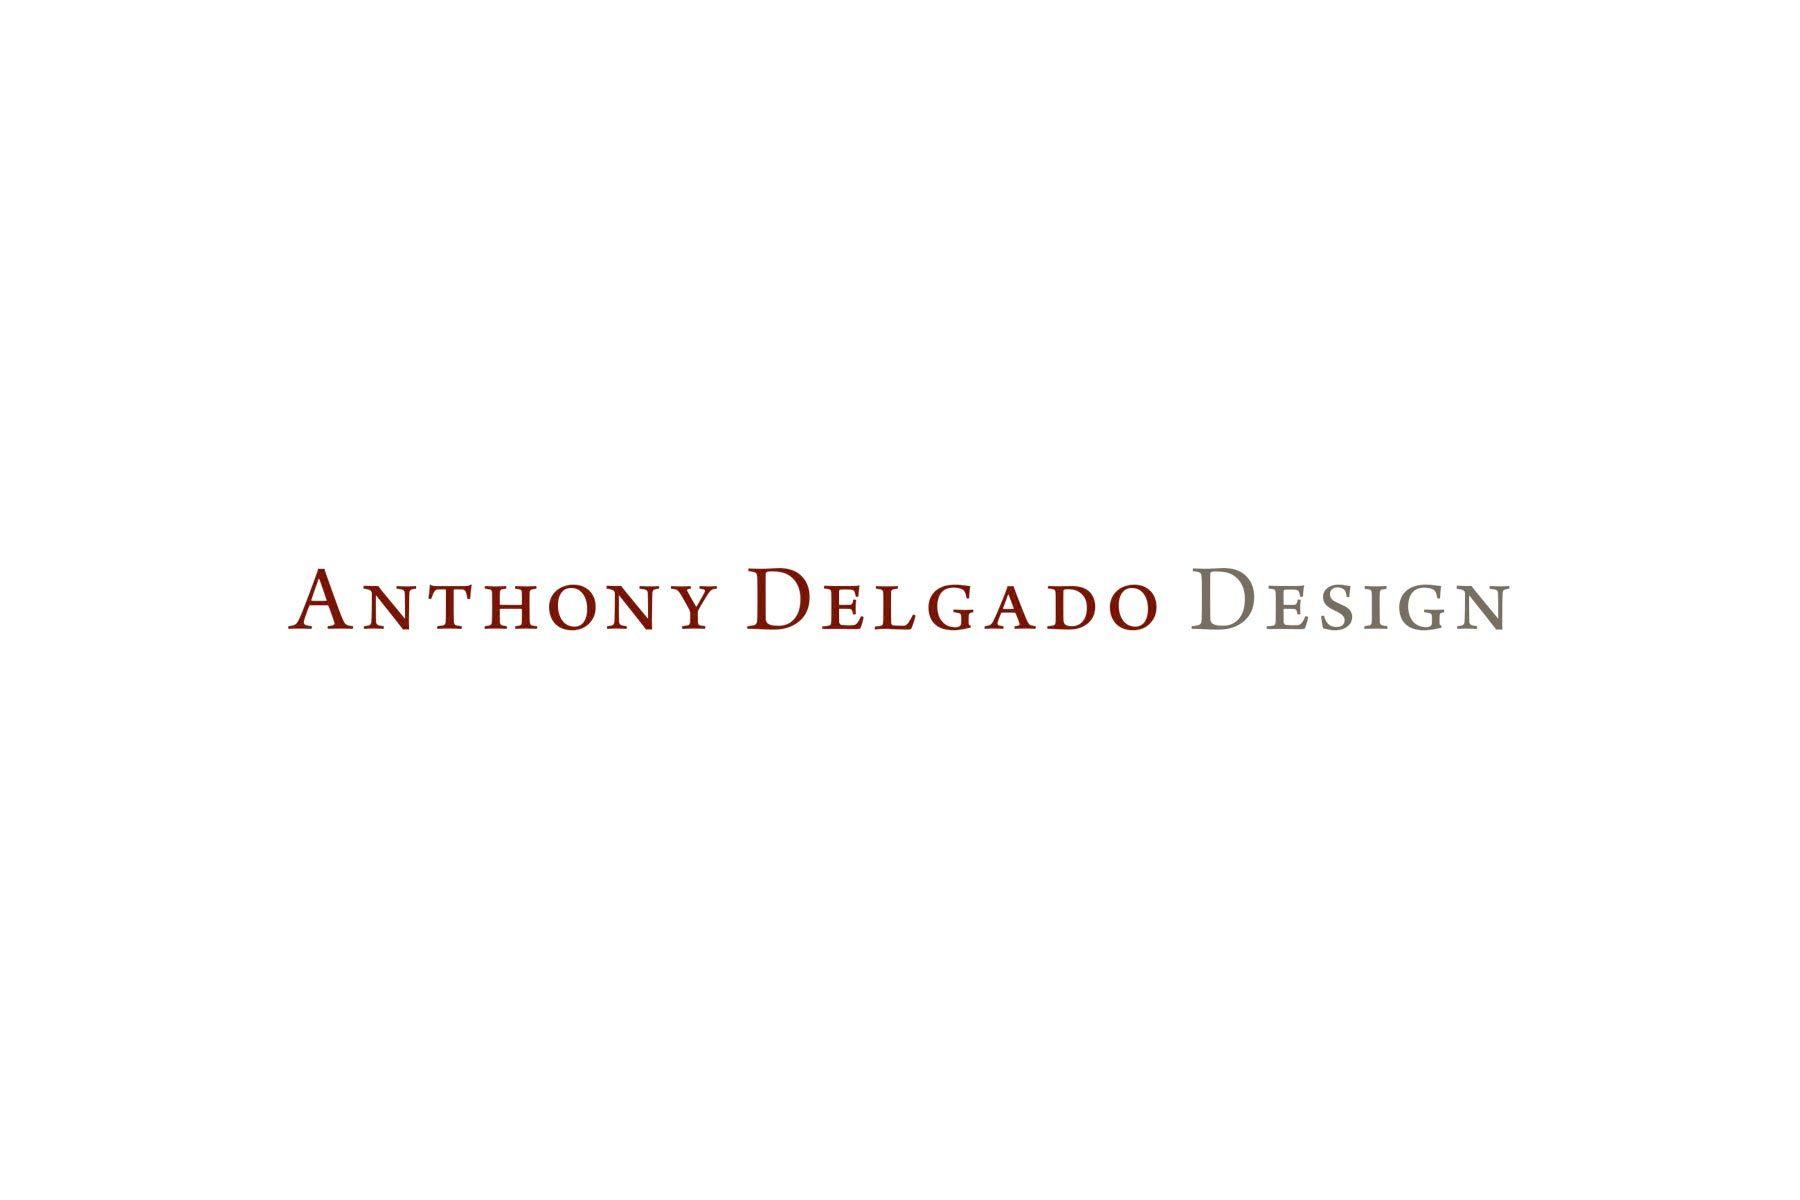 anthony_delgado_design.jpg